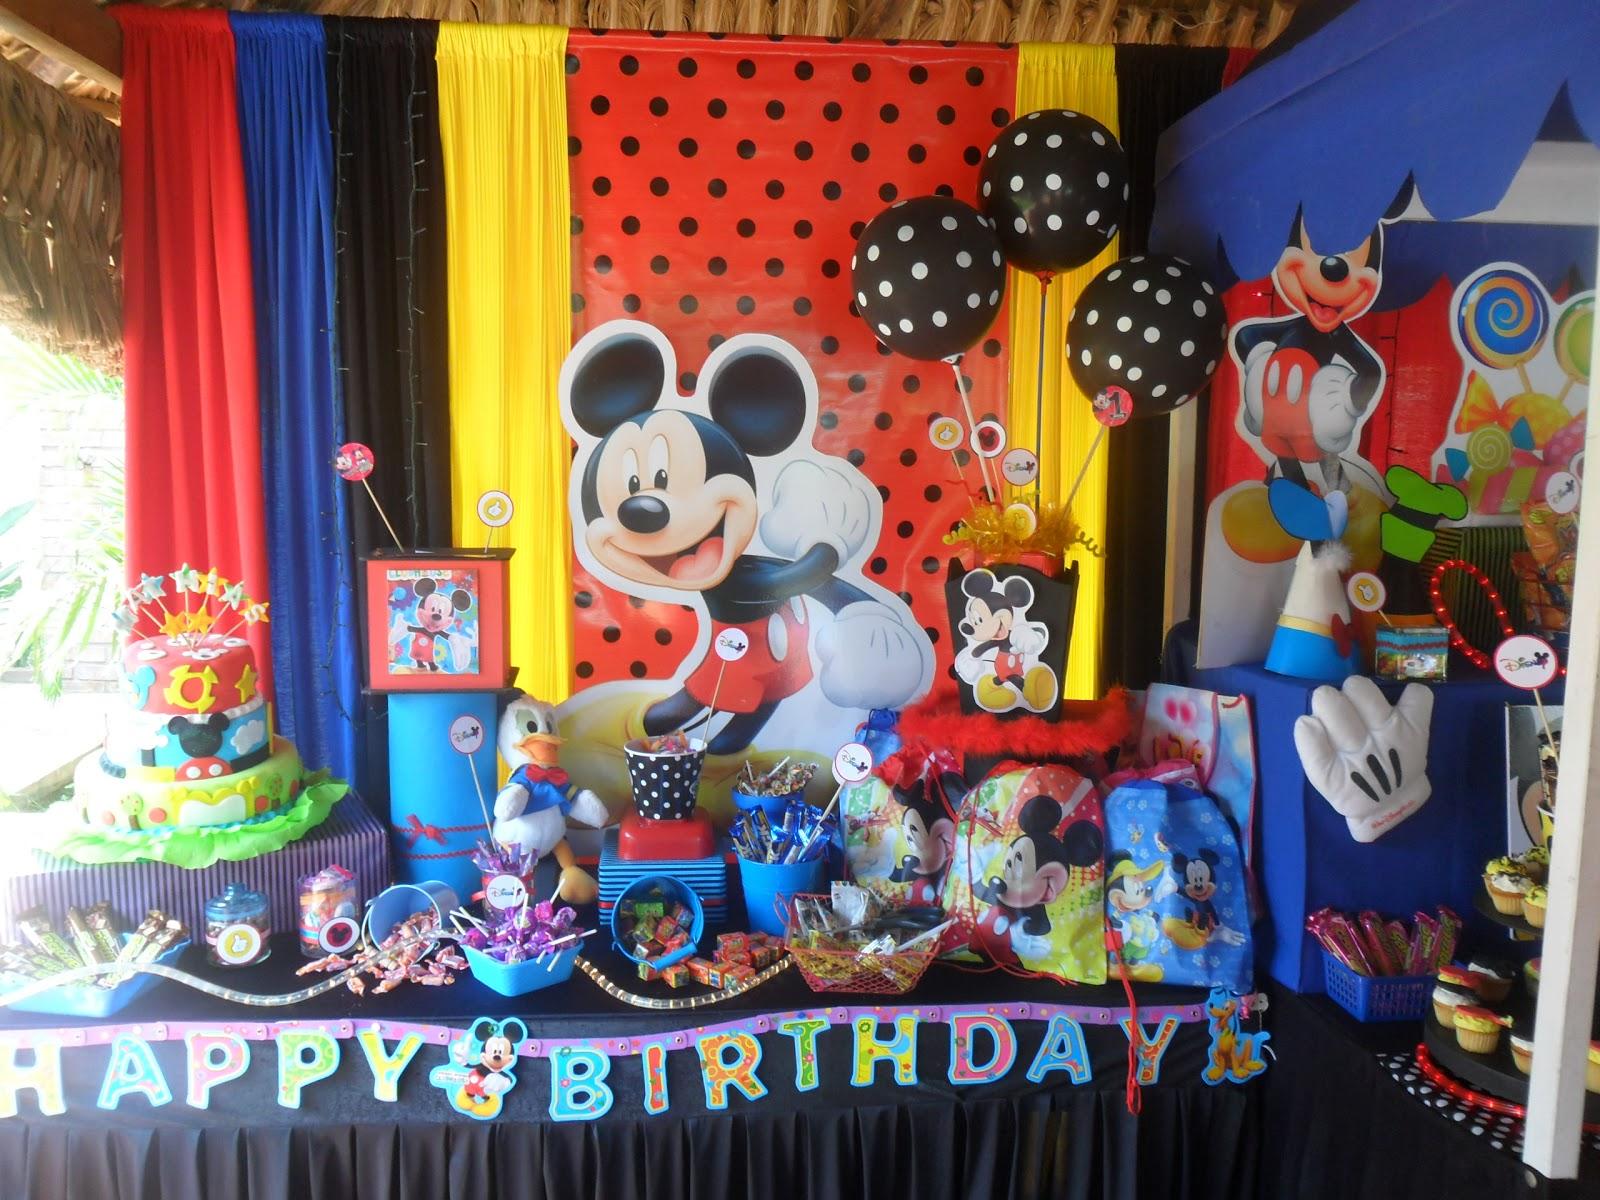 Ursula newman eventos decoracion fiesta infantil mickey - Decoracion para fiestas infantiles mickey mouse ...